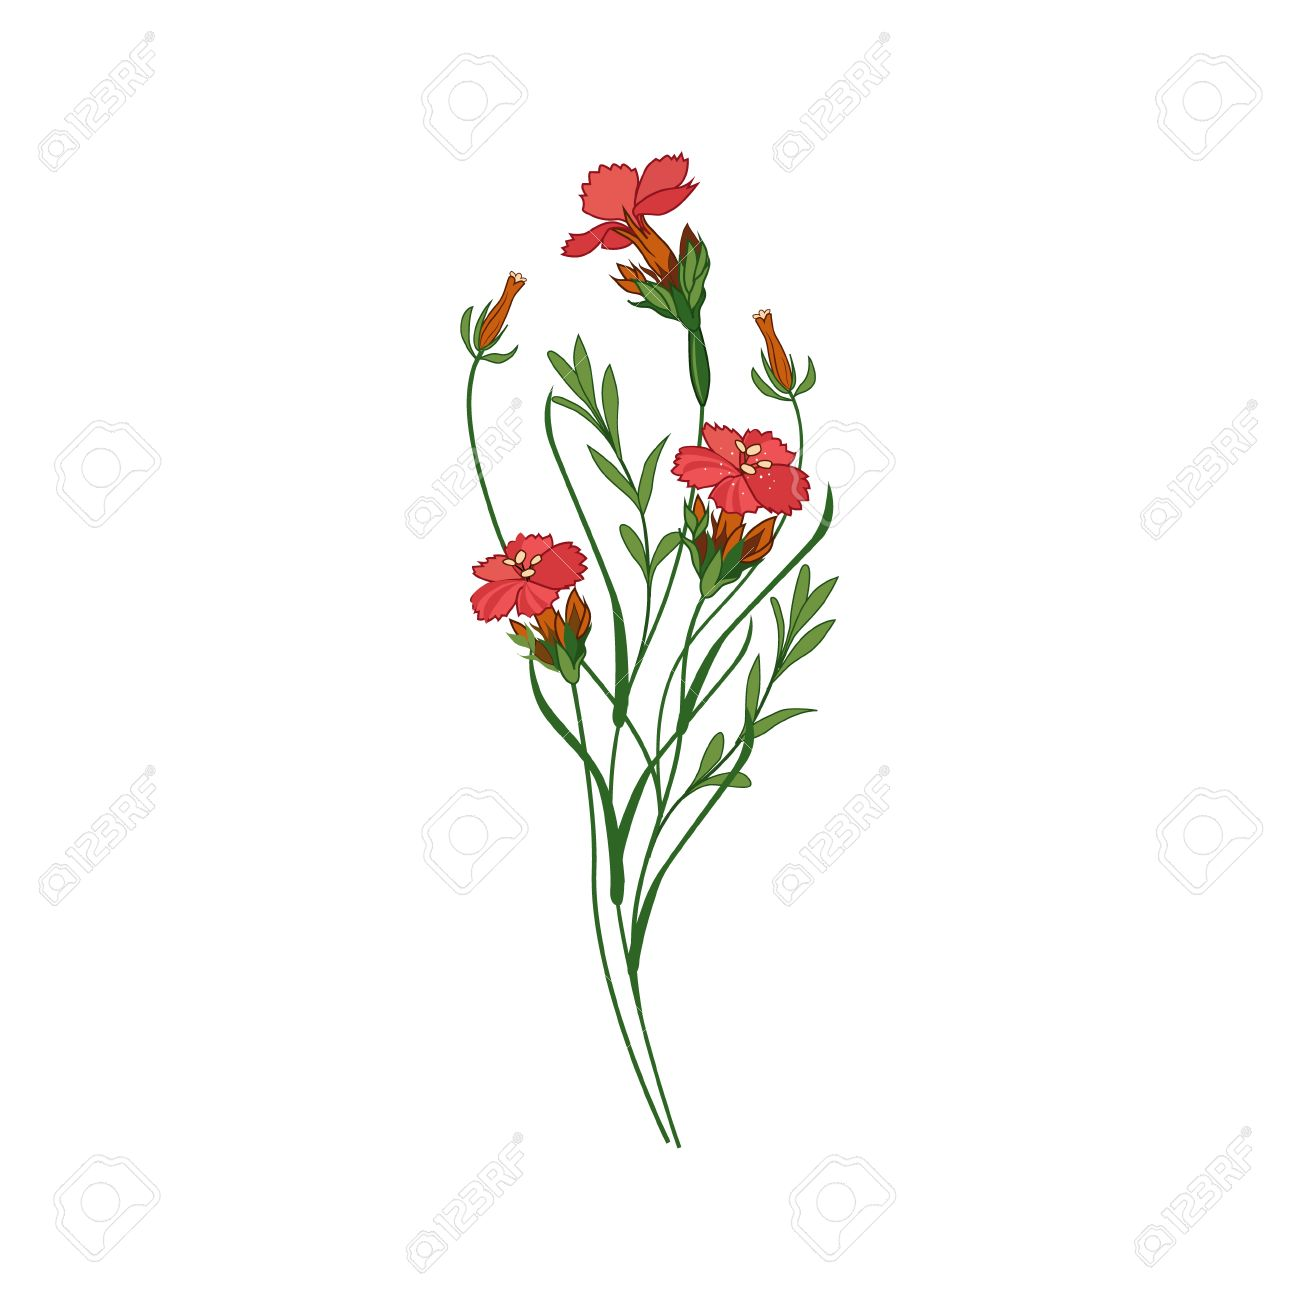 Sweet William Wild Flower Hand Drawn Detailed Illustration Plant